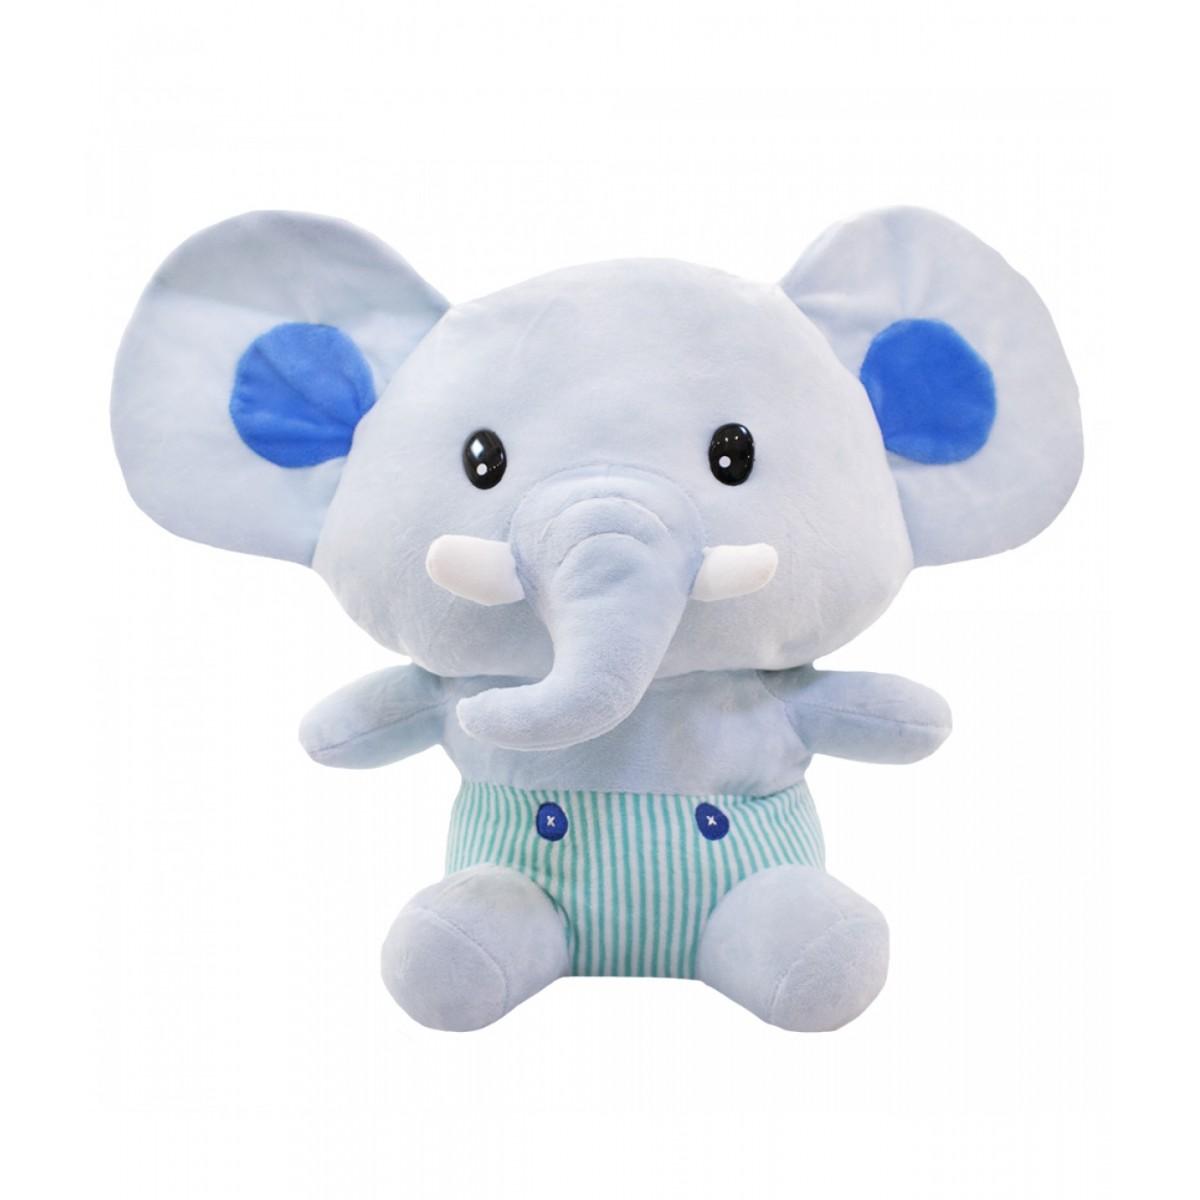 Pelúcia de Elefante Bebê Azul 30cm Poliéster